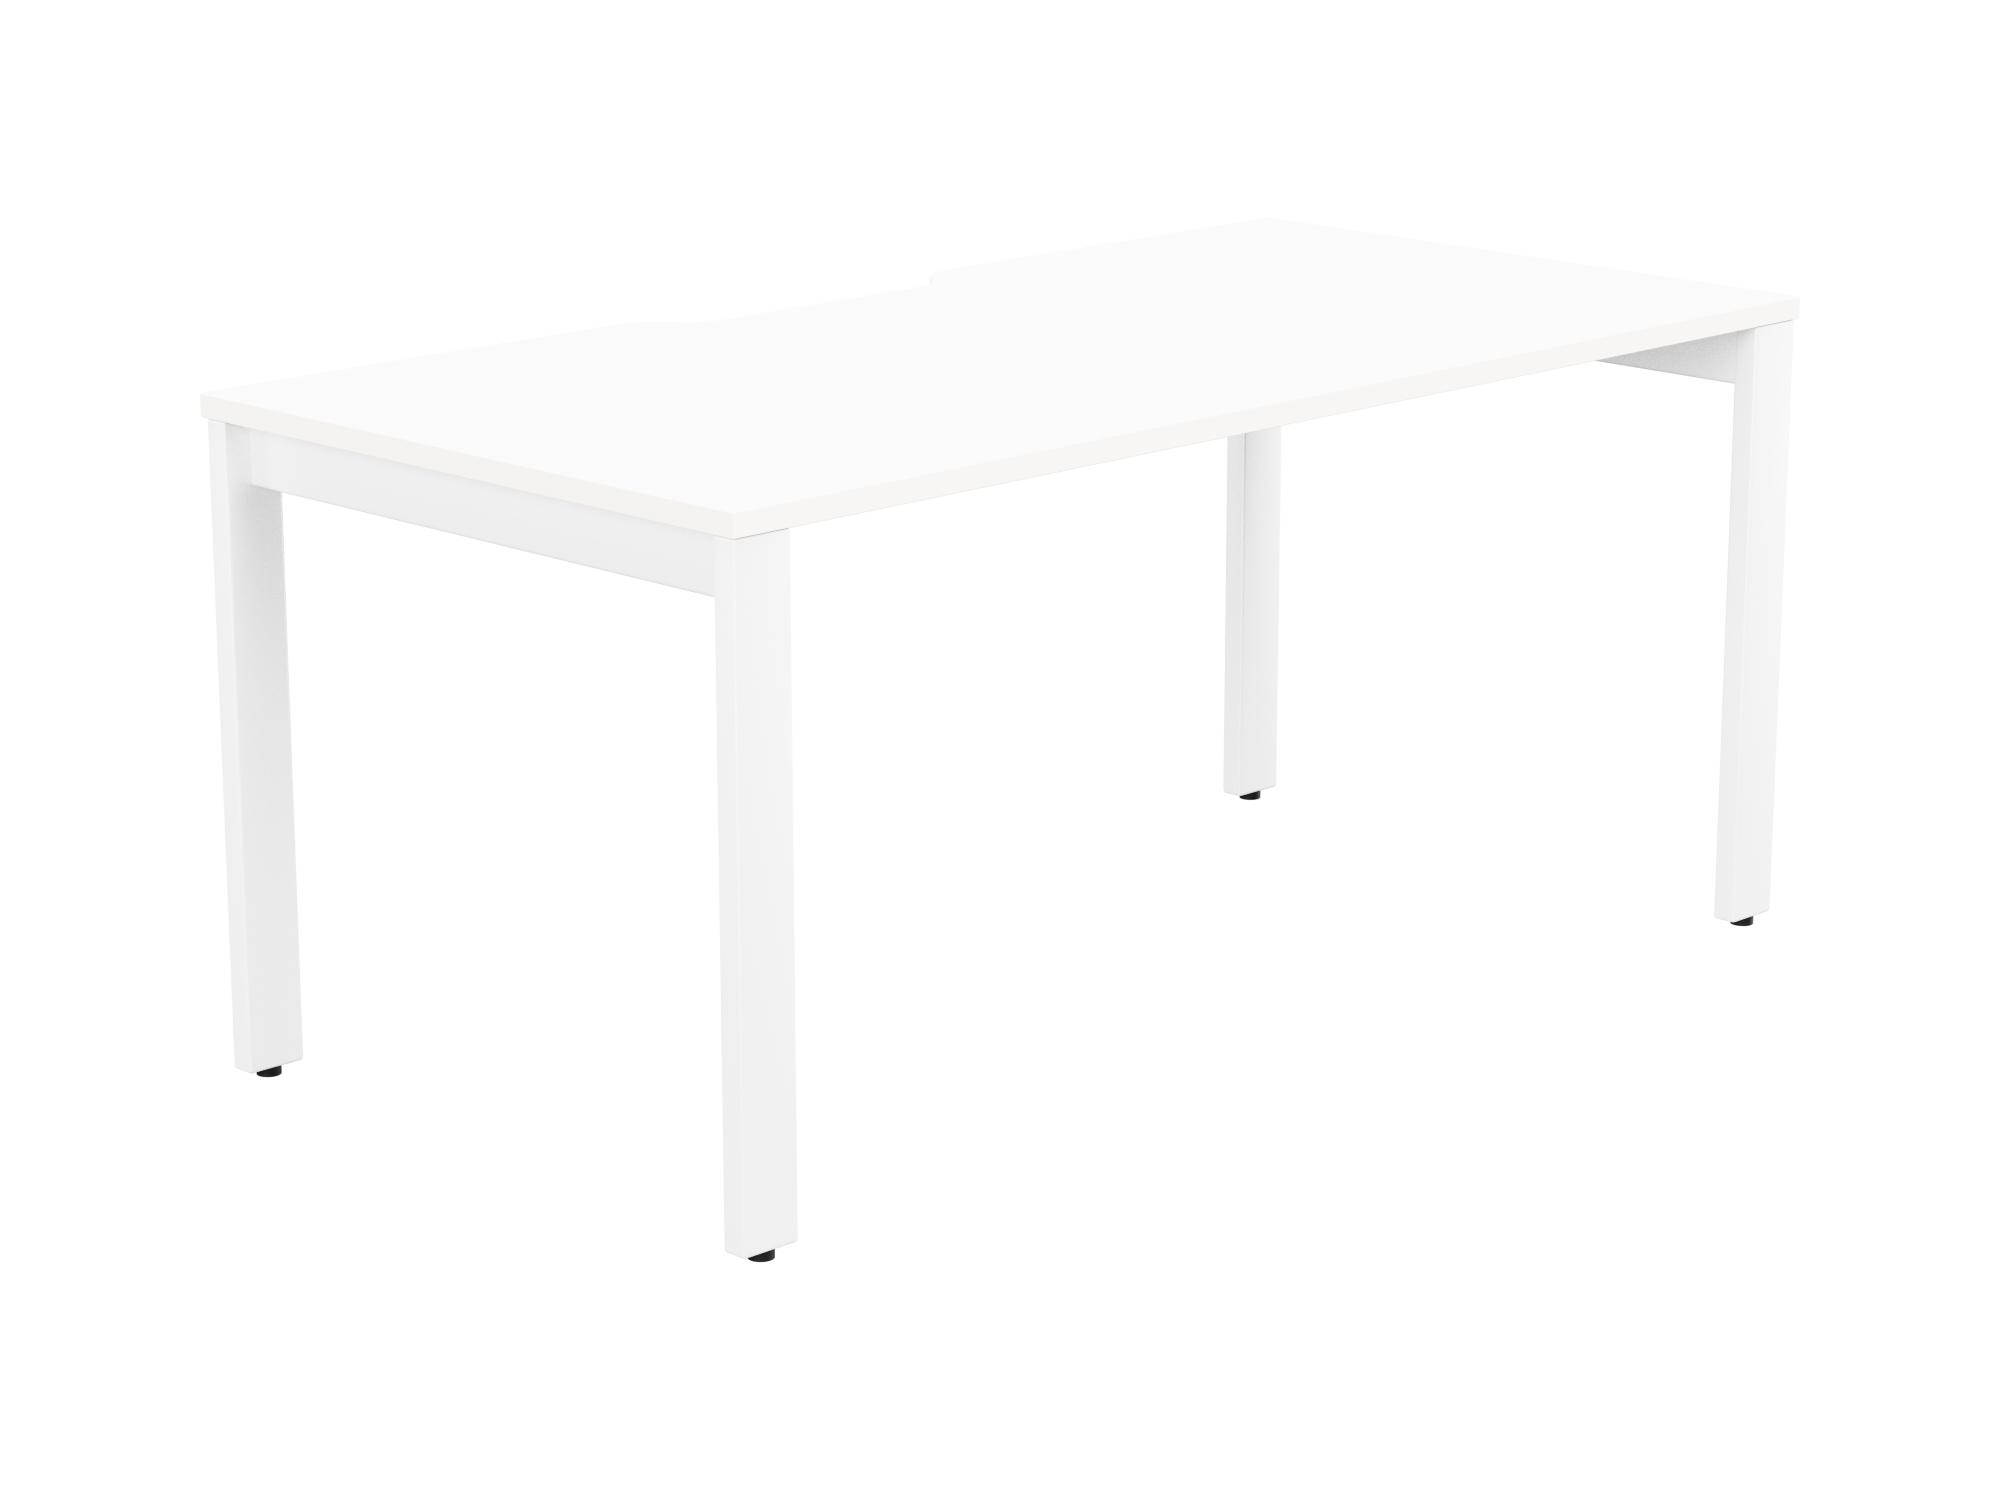 Switch 1 Person Bench Open Leg Scallop Top 1400 x 800 - White Frame / White Top